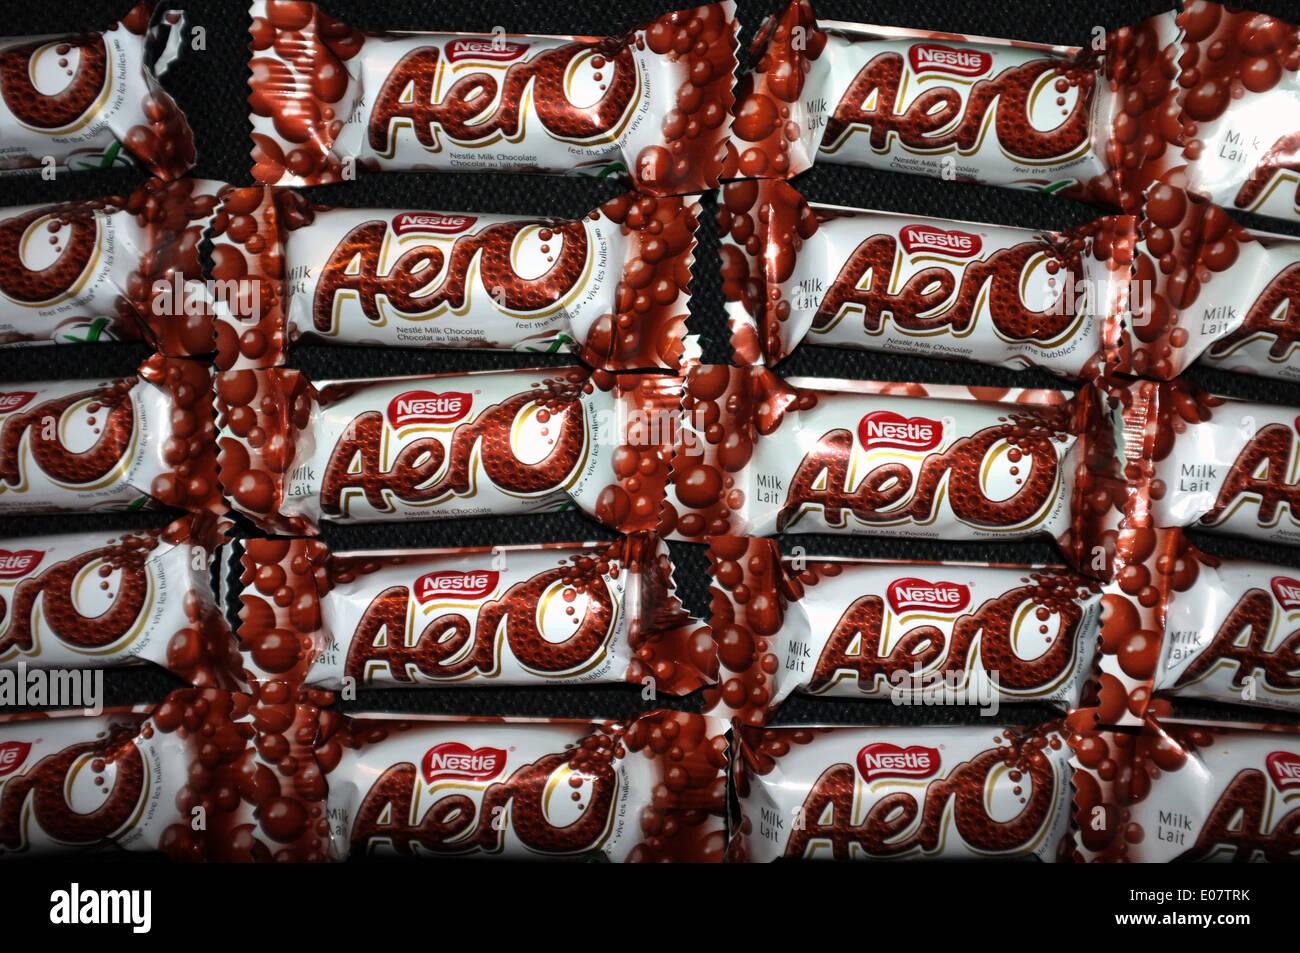 Aero chocolate bars photographed against a black background. - Stock Image